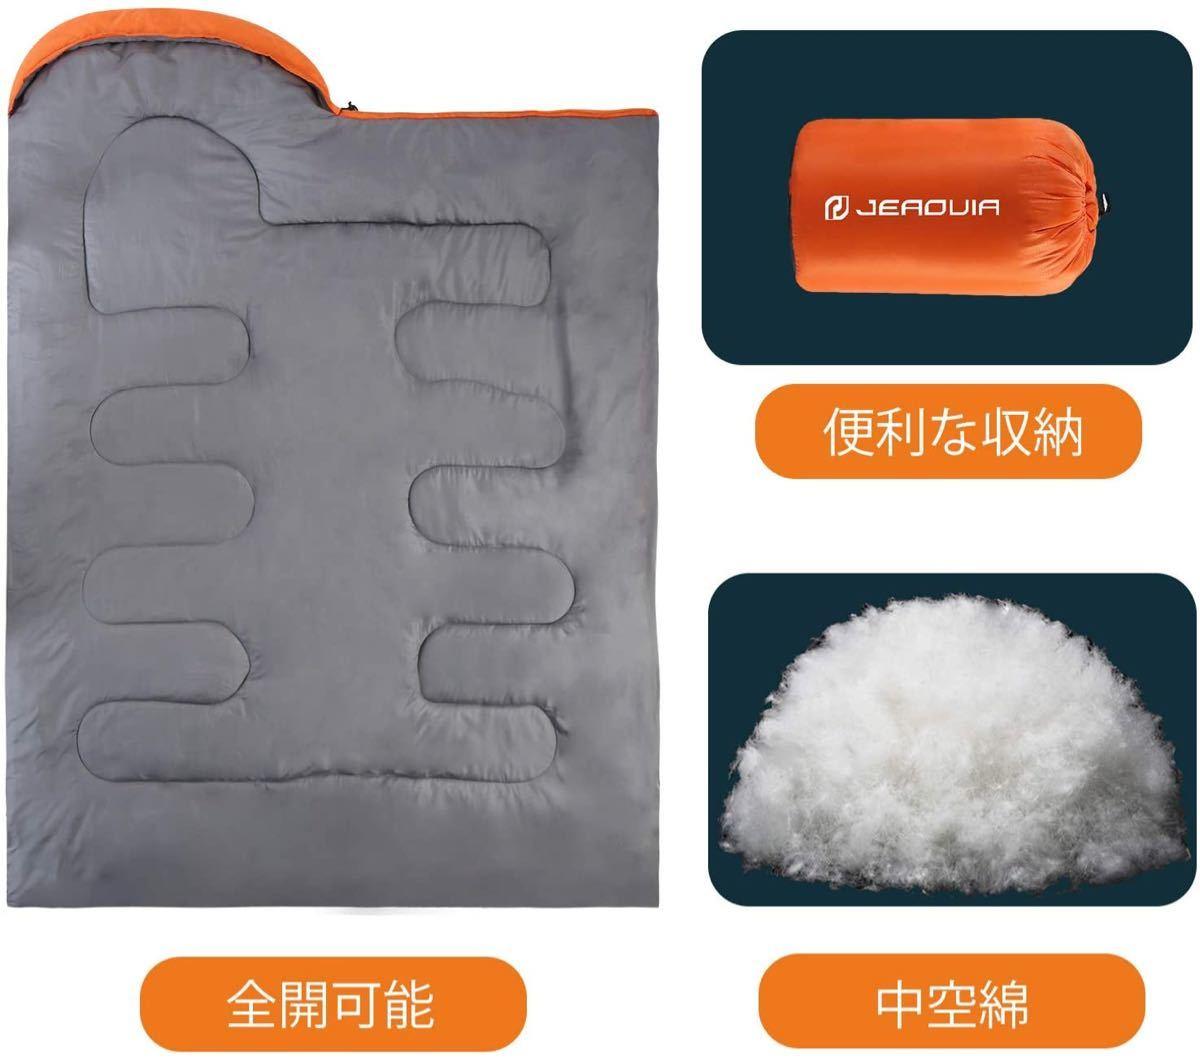 封筒型寝袋 1.35kg 春夏秋の使用可能 軽量 保温 防水 簡単収納シュラフ